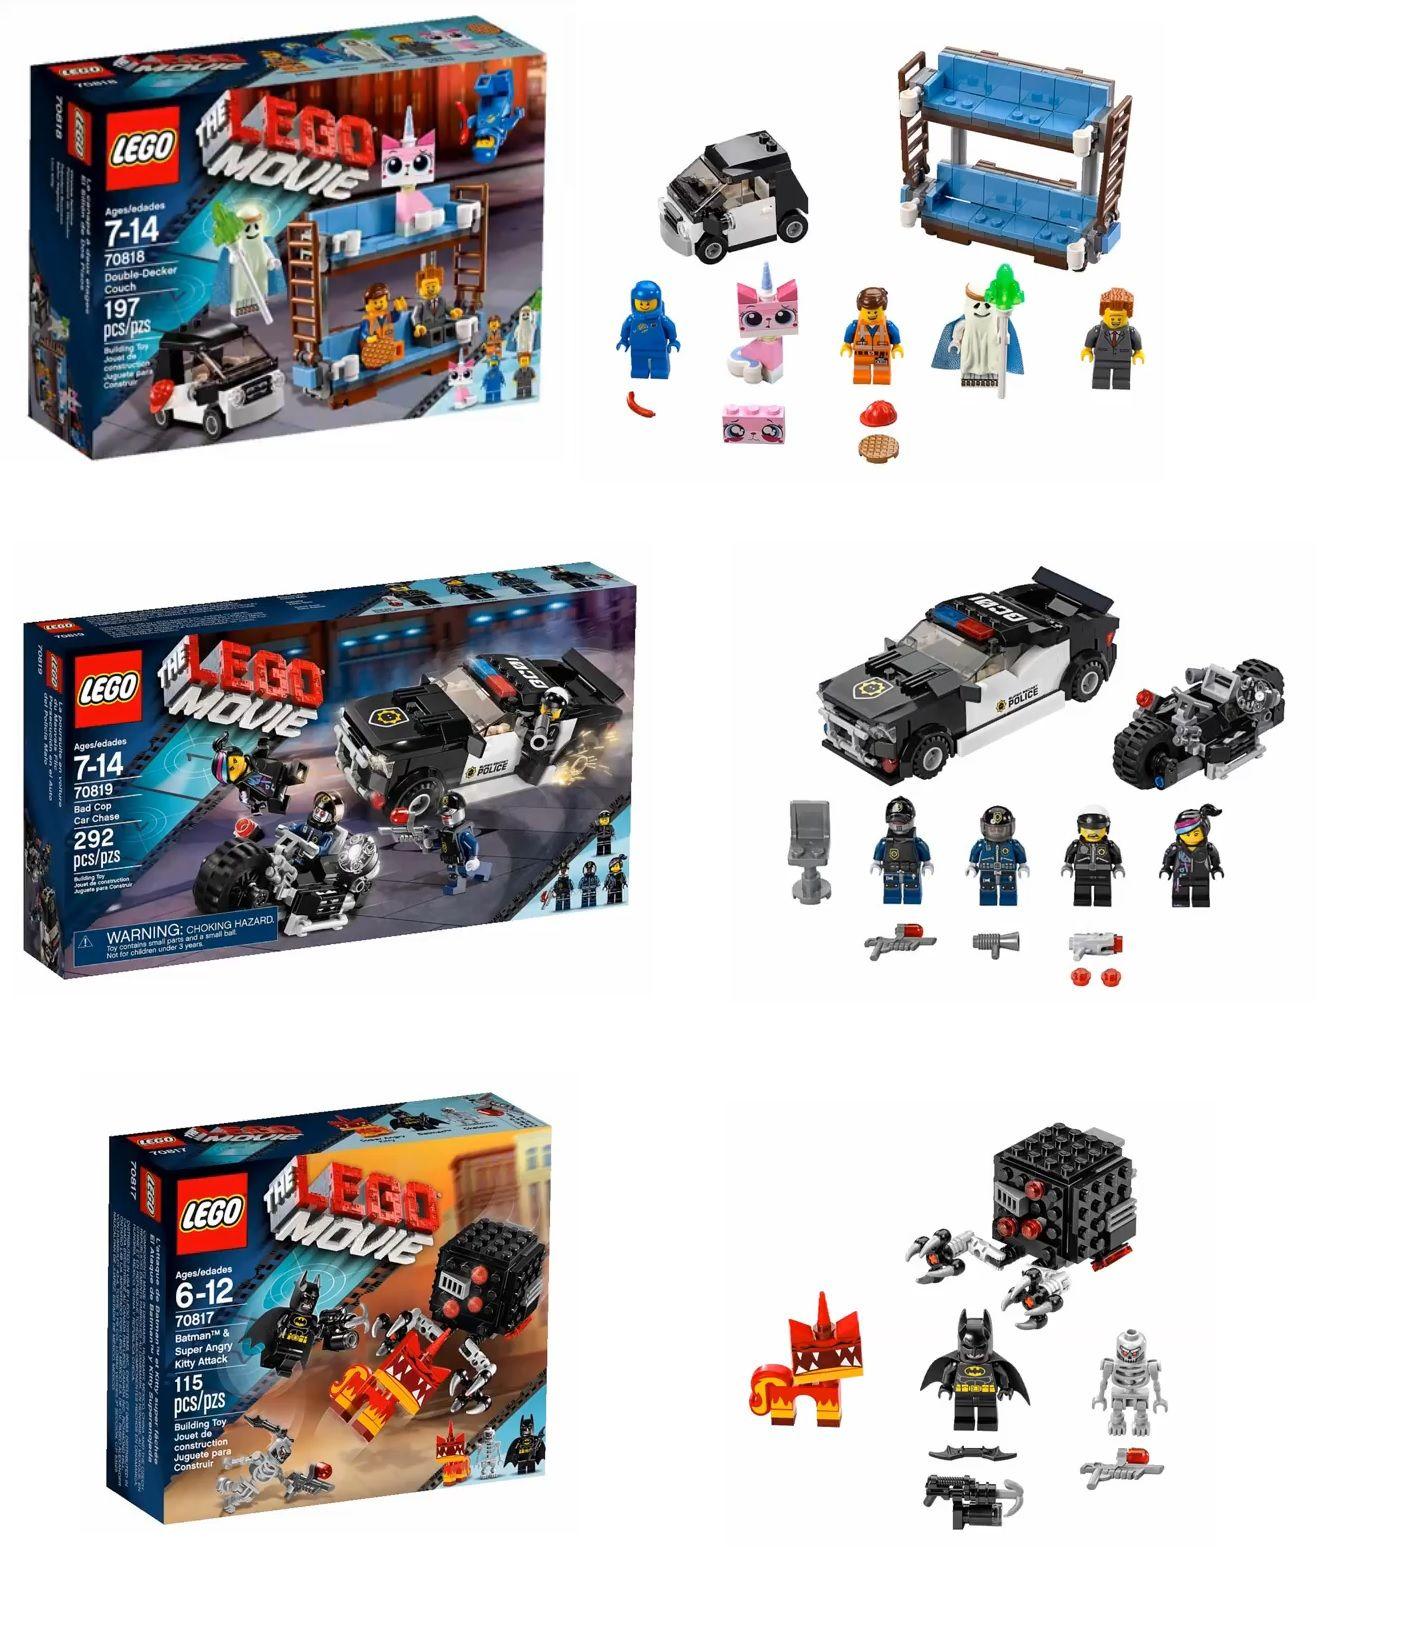 Lego Movie 2015 Sets Google Search Lego Movie Sets Lego Lego Movie